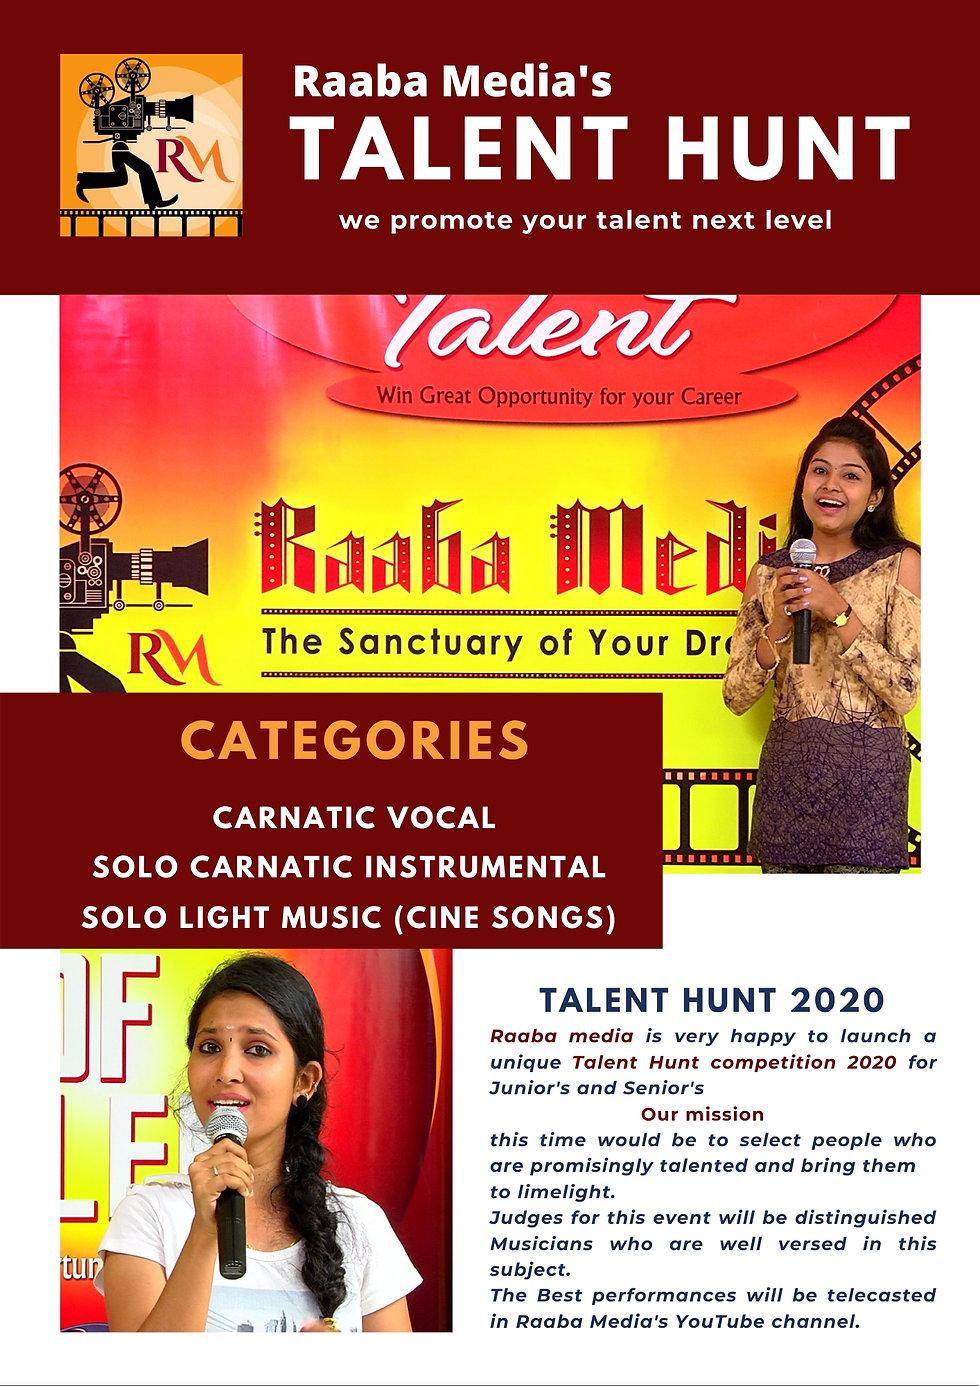 raabamedia's talent hunt MUSIC 01.jpg